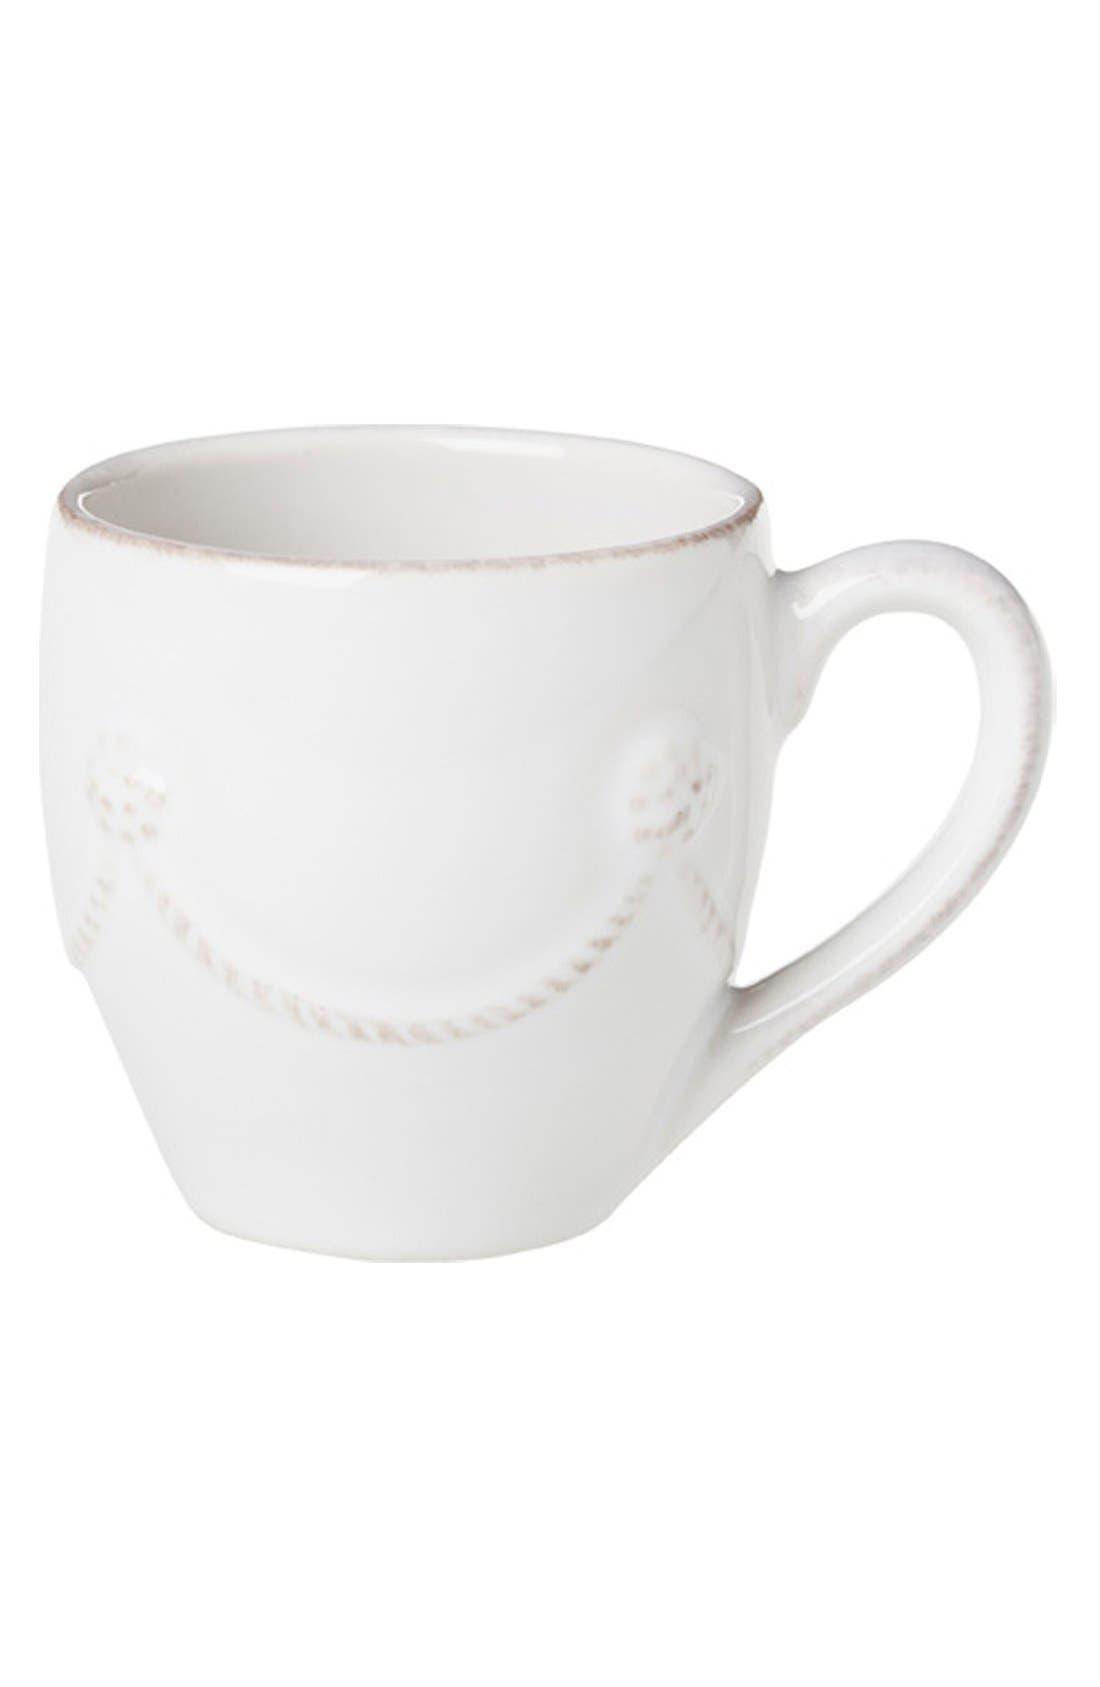 Alternate Image 1 Selected - Juliska 'Berry and Thread' Ceramic Demitasse Coffee Mug